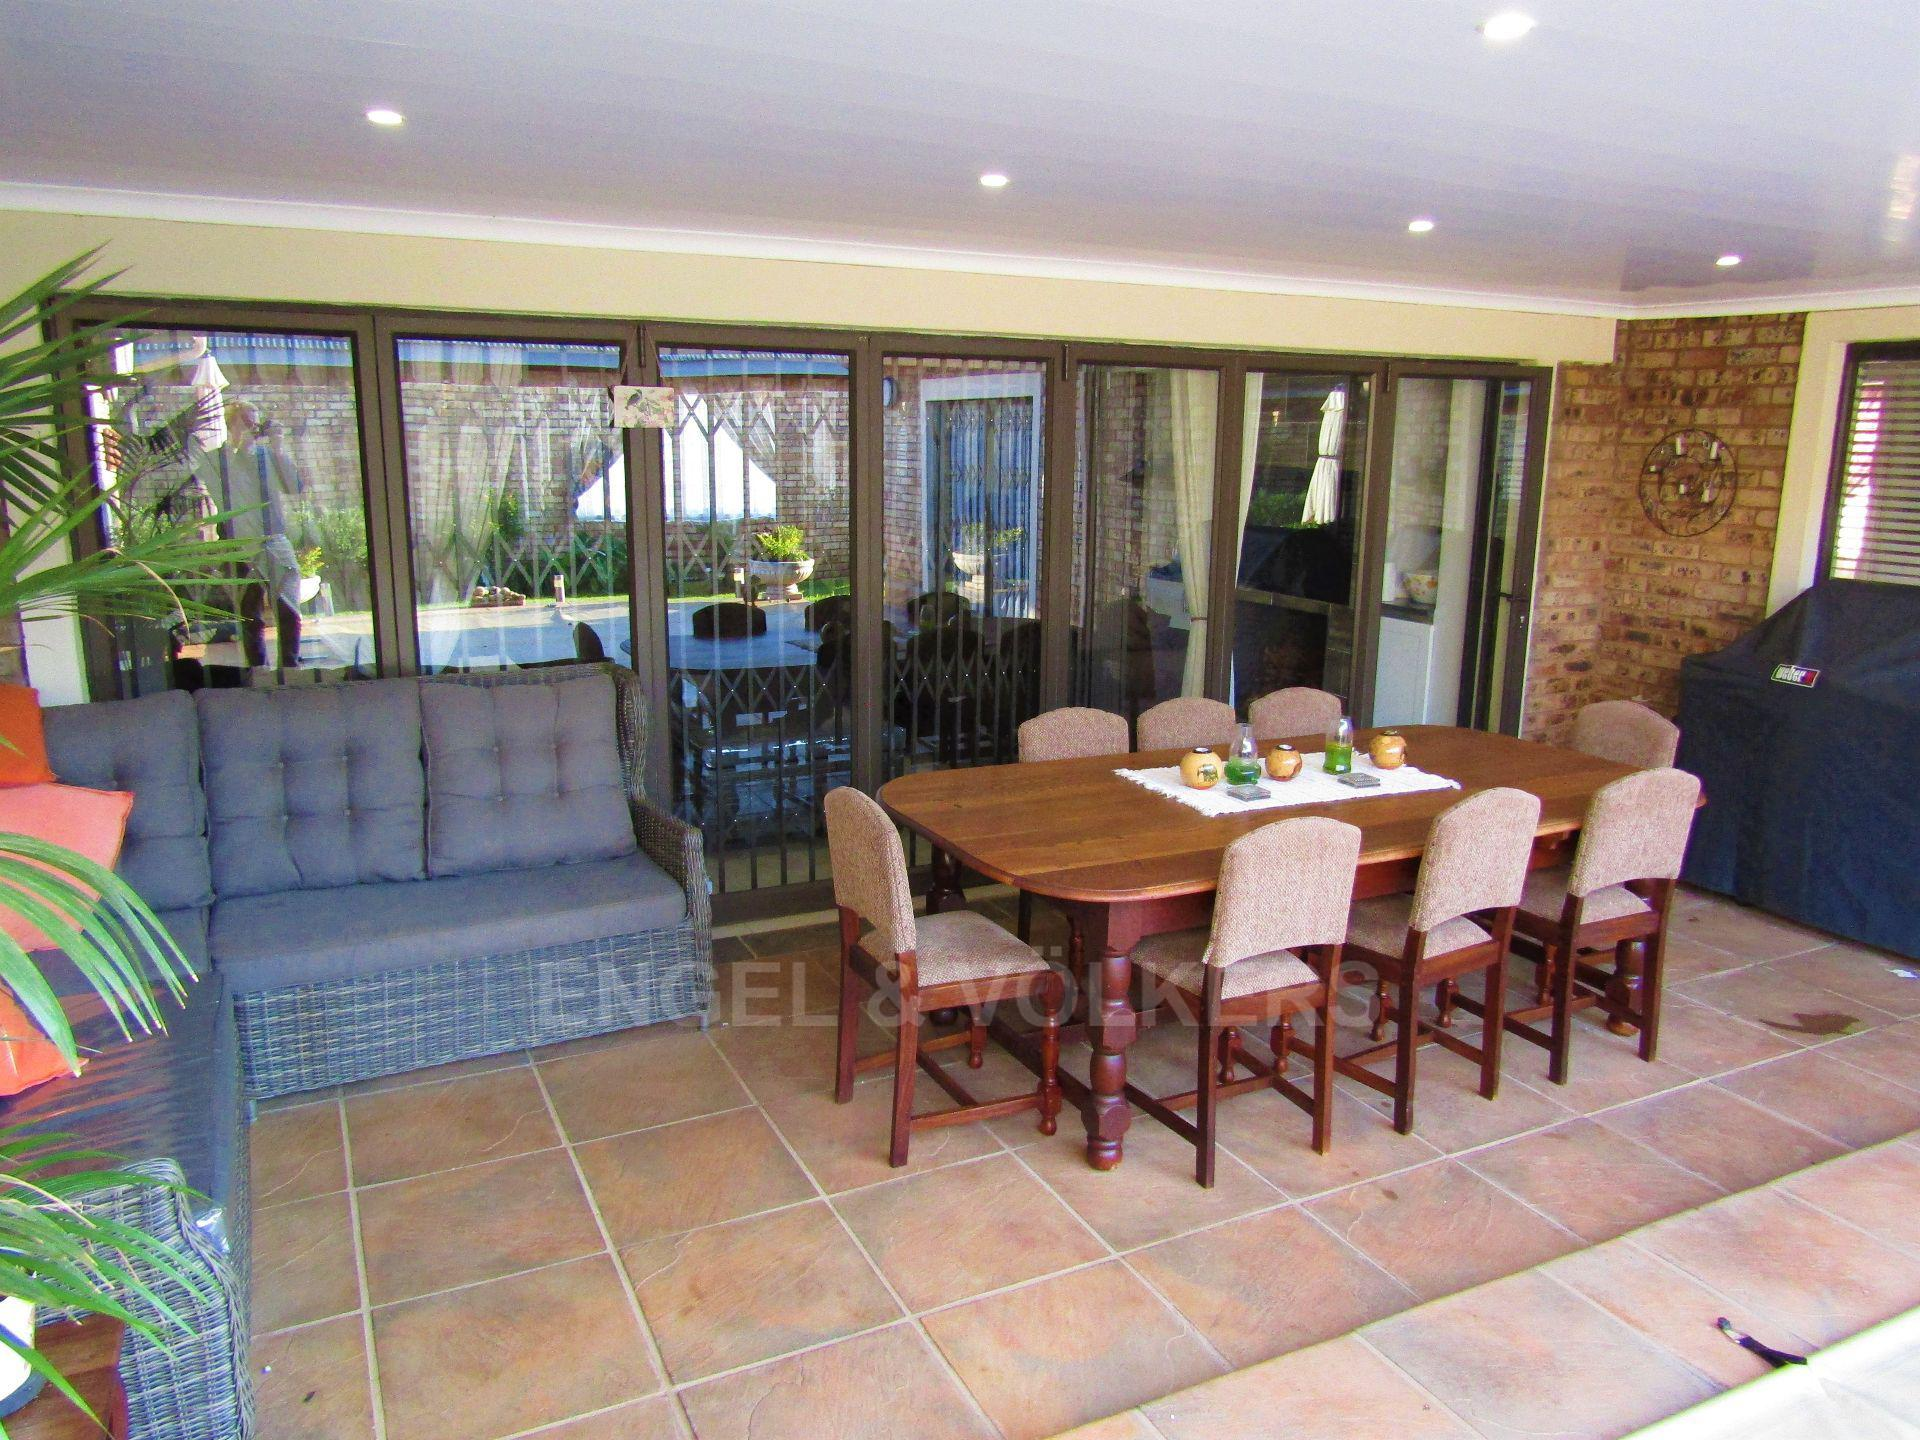 Lifestyle Estate property for sale. Ref No: 13458759. Picture no 11